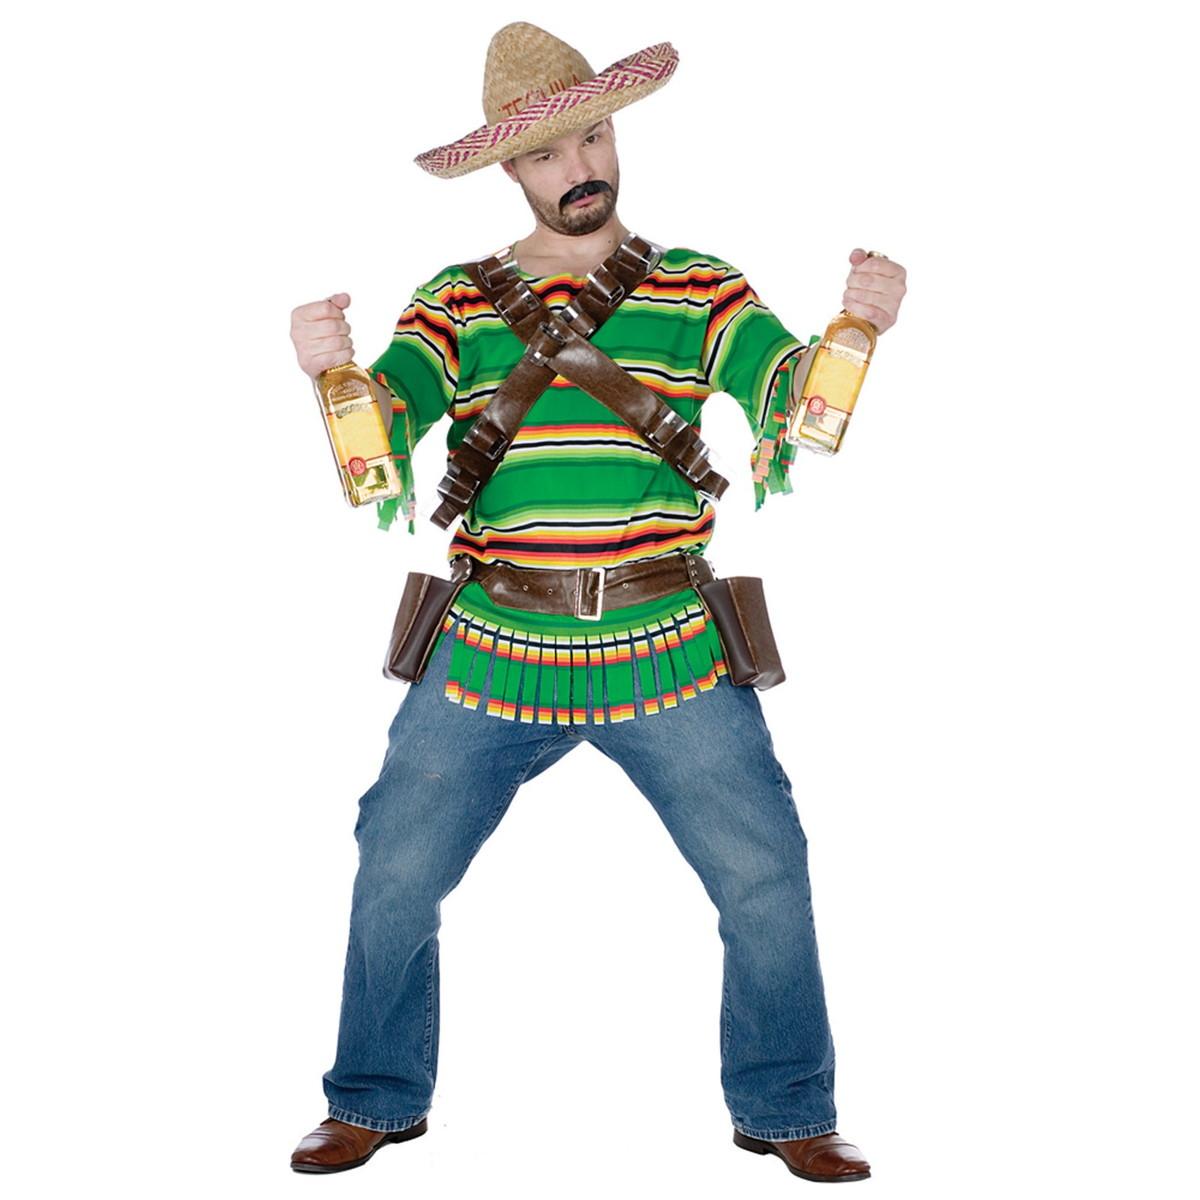 acomes | Rakuten Global Market: Halloween adult costumes Mexican ...